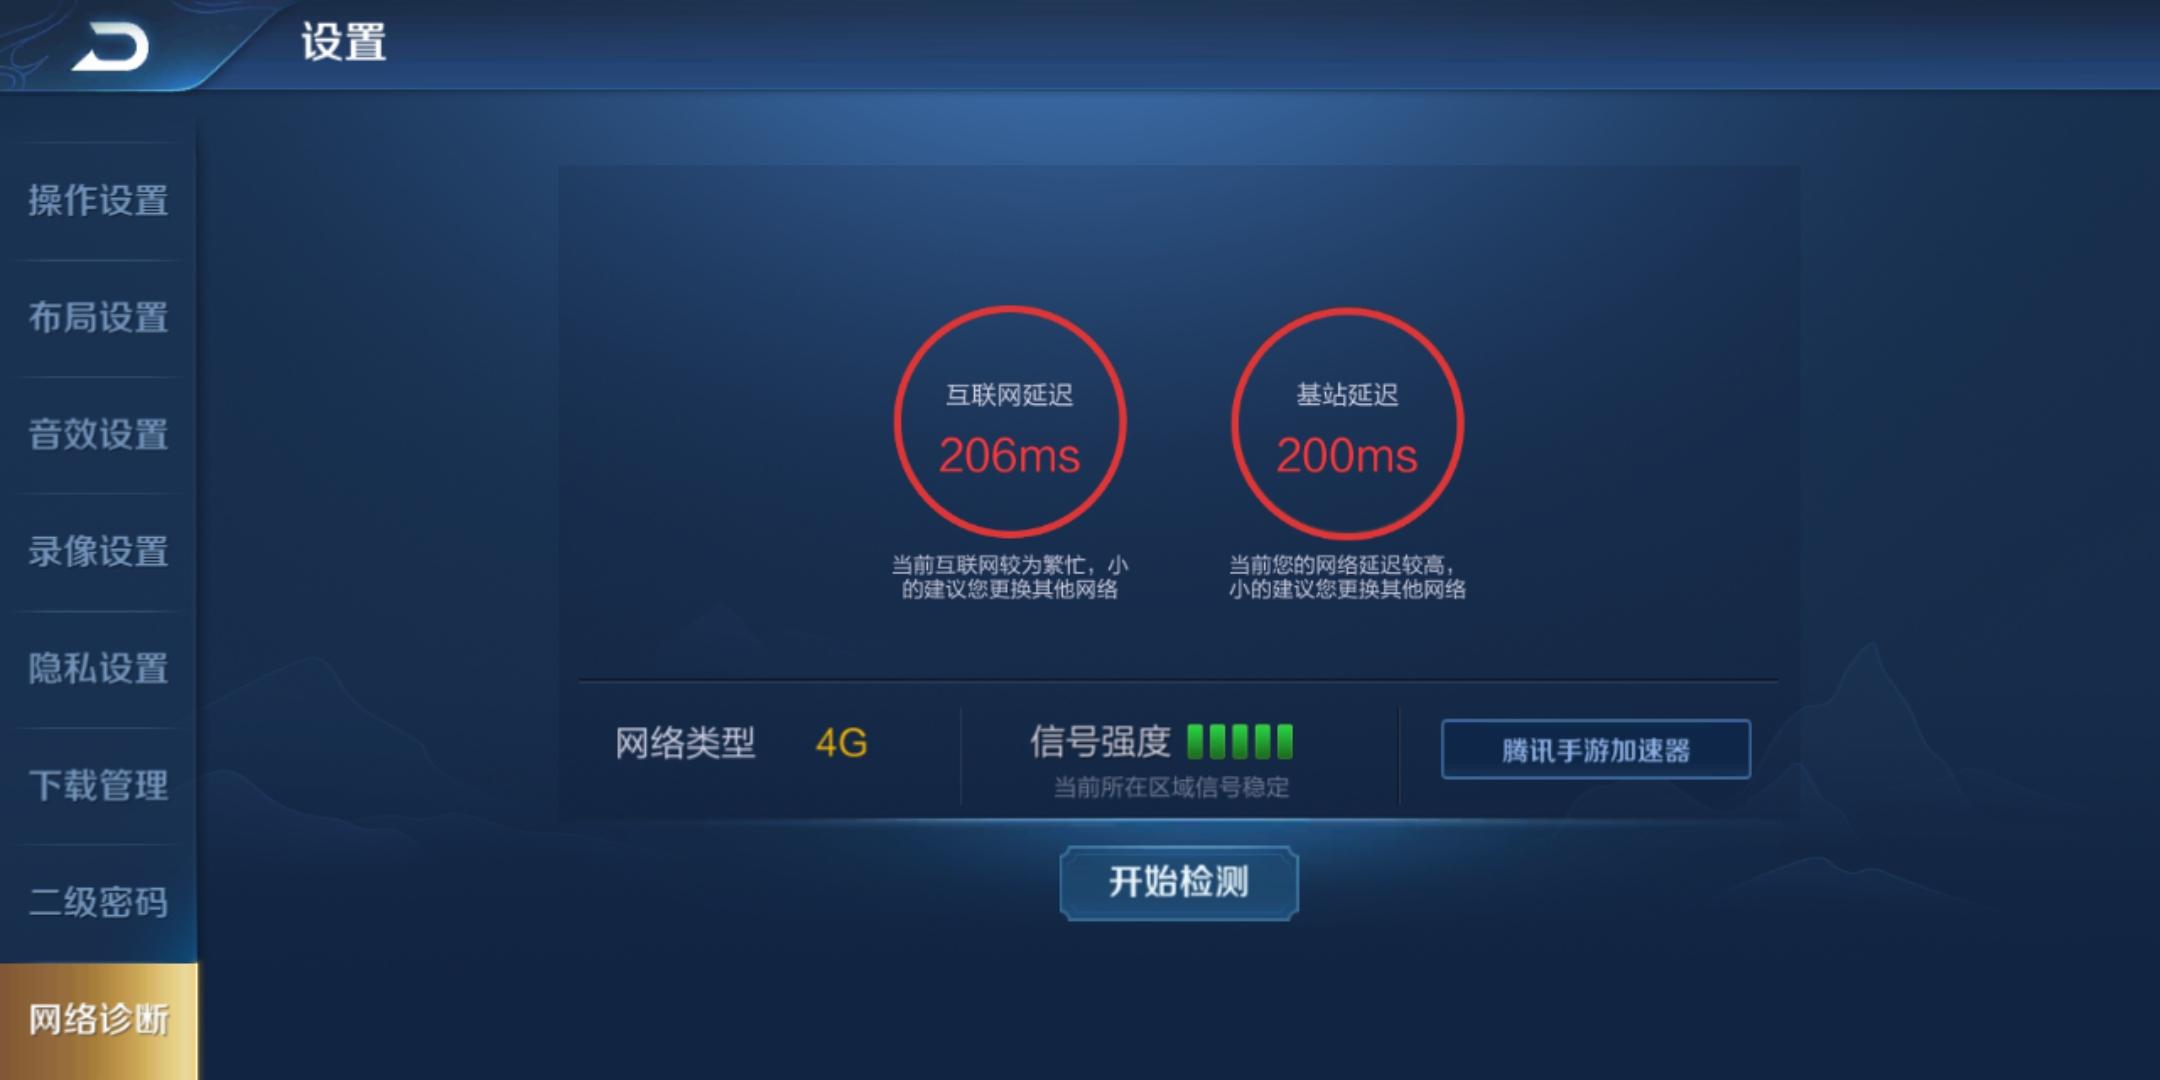 Screenshot_20200516_111912_com.tencent.tmgp.sgame.jpg